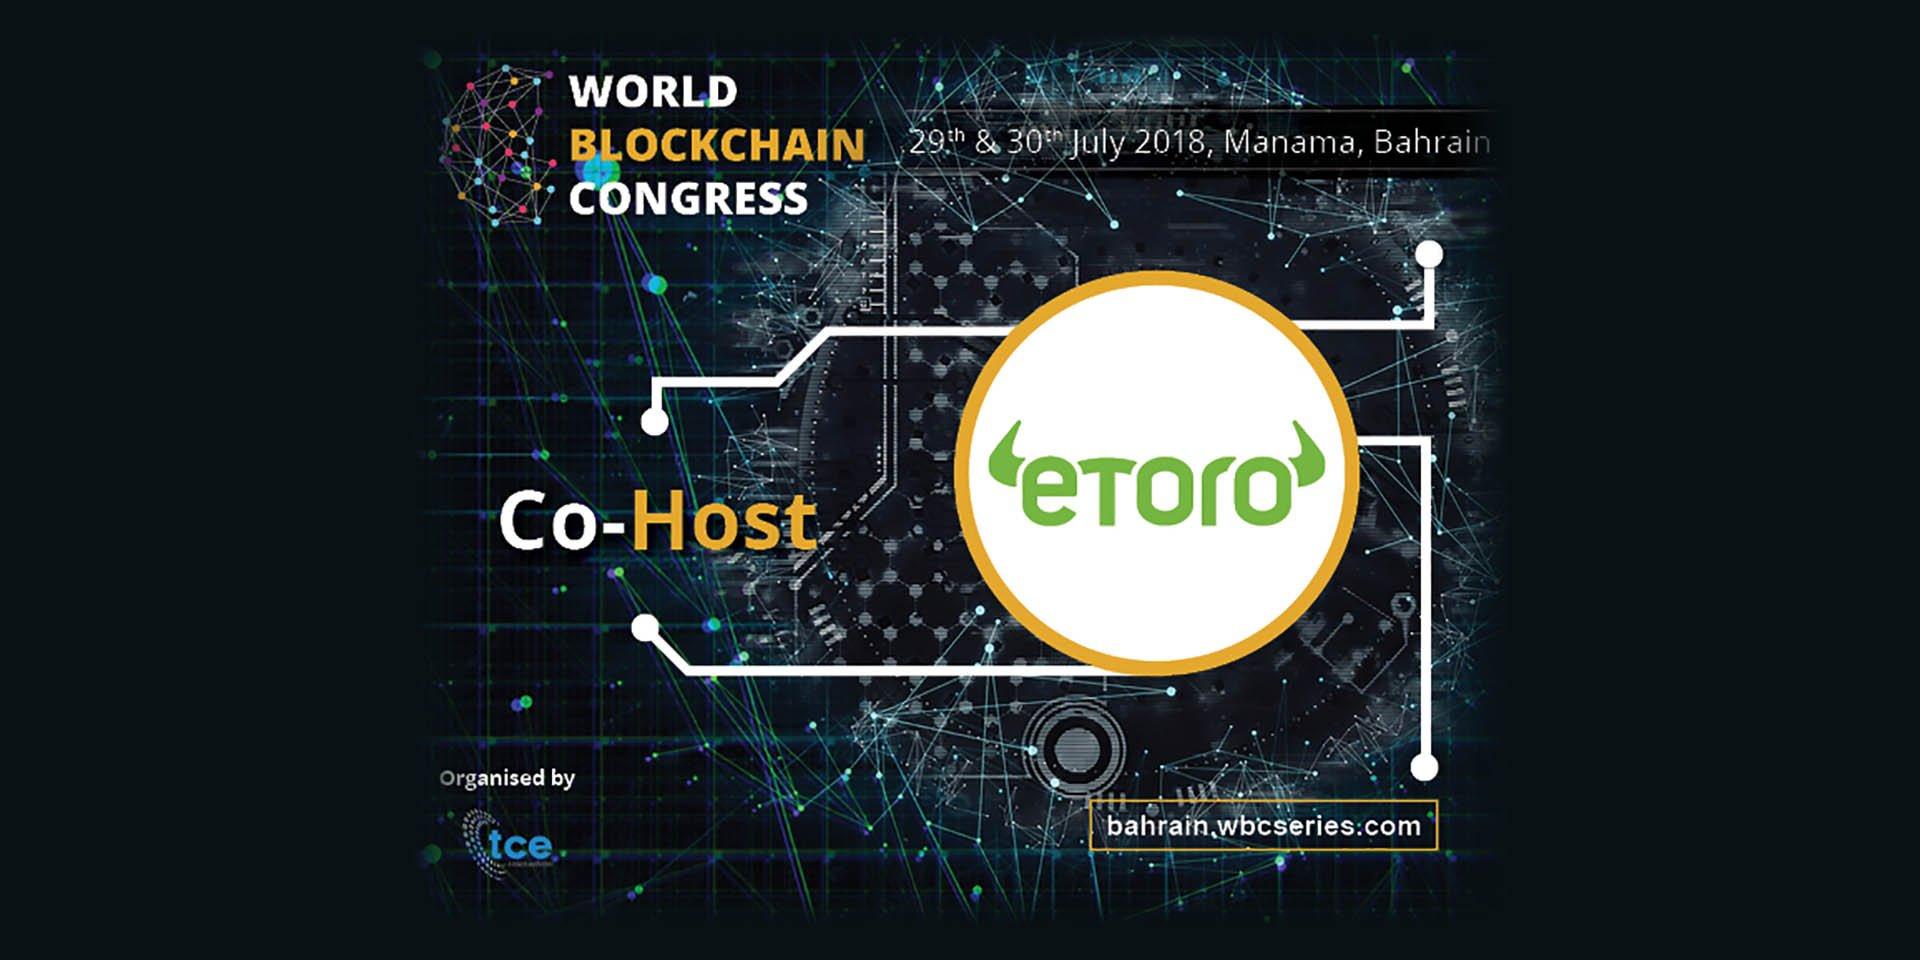 eToro confirmed as the Official Host for World Blockchain Congress Bahrain 2018